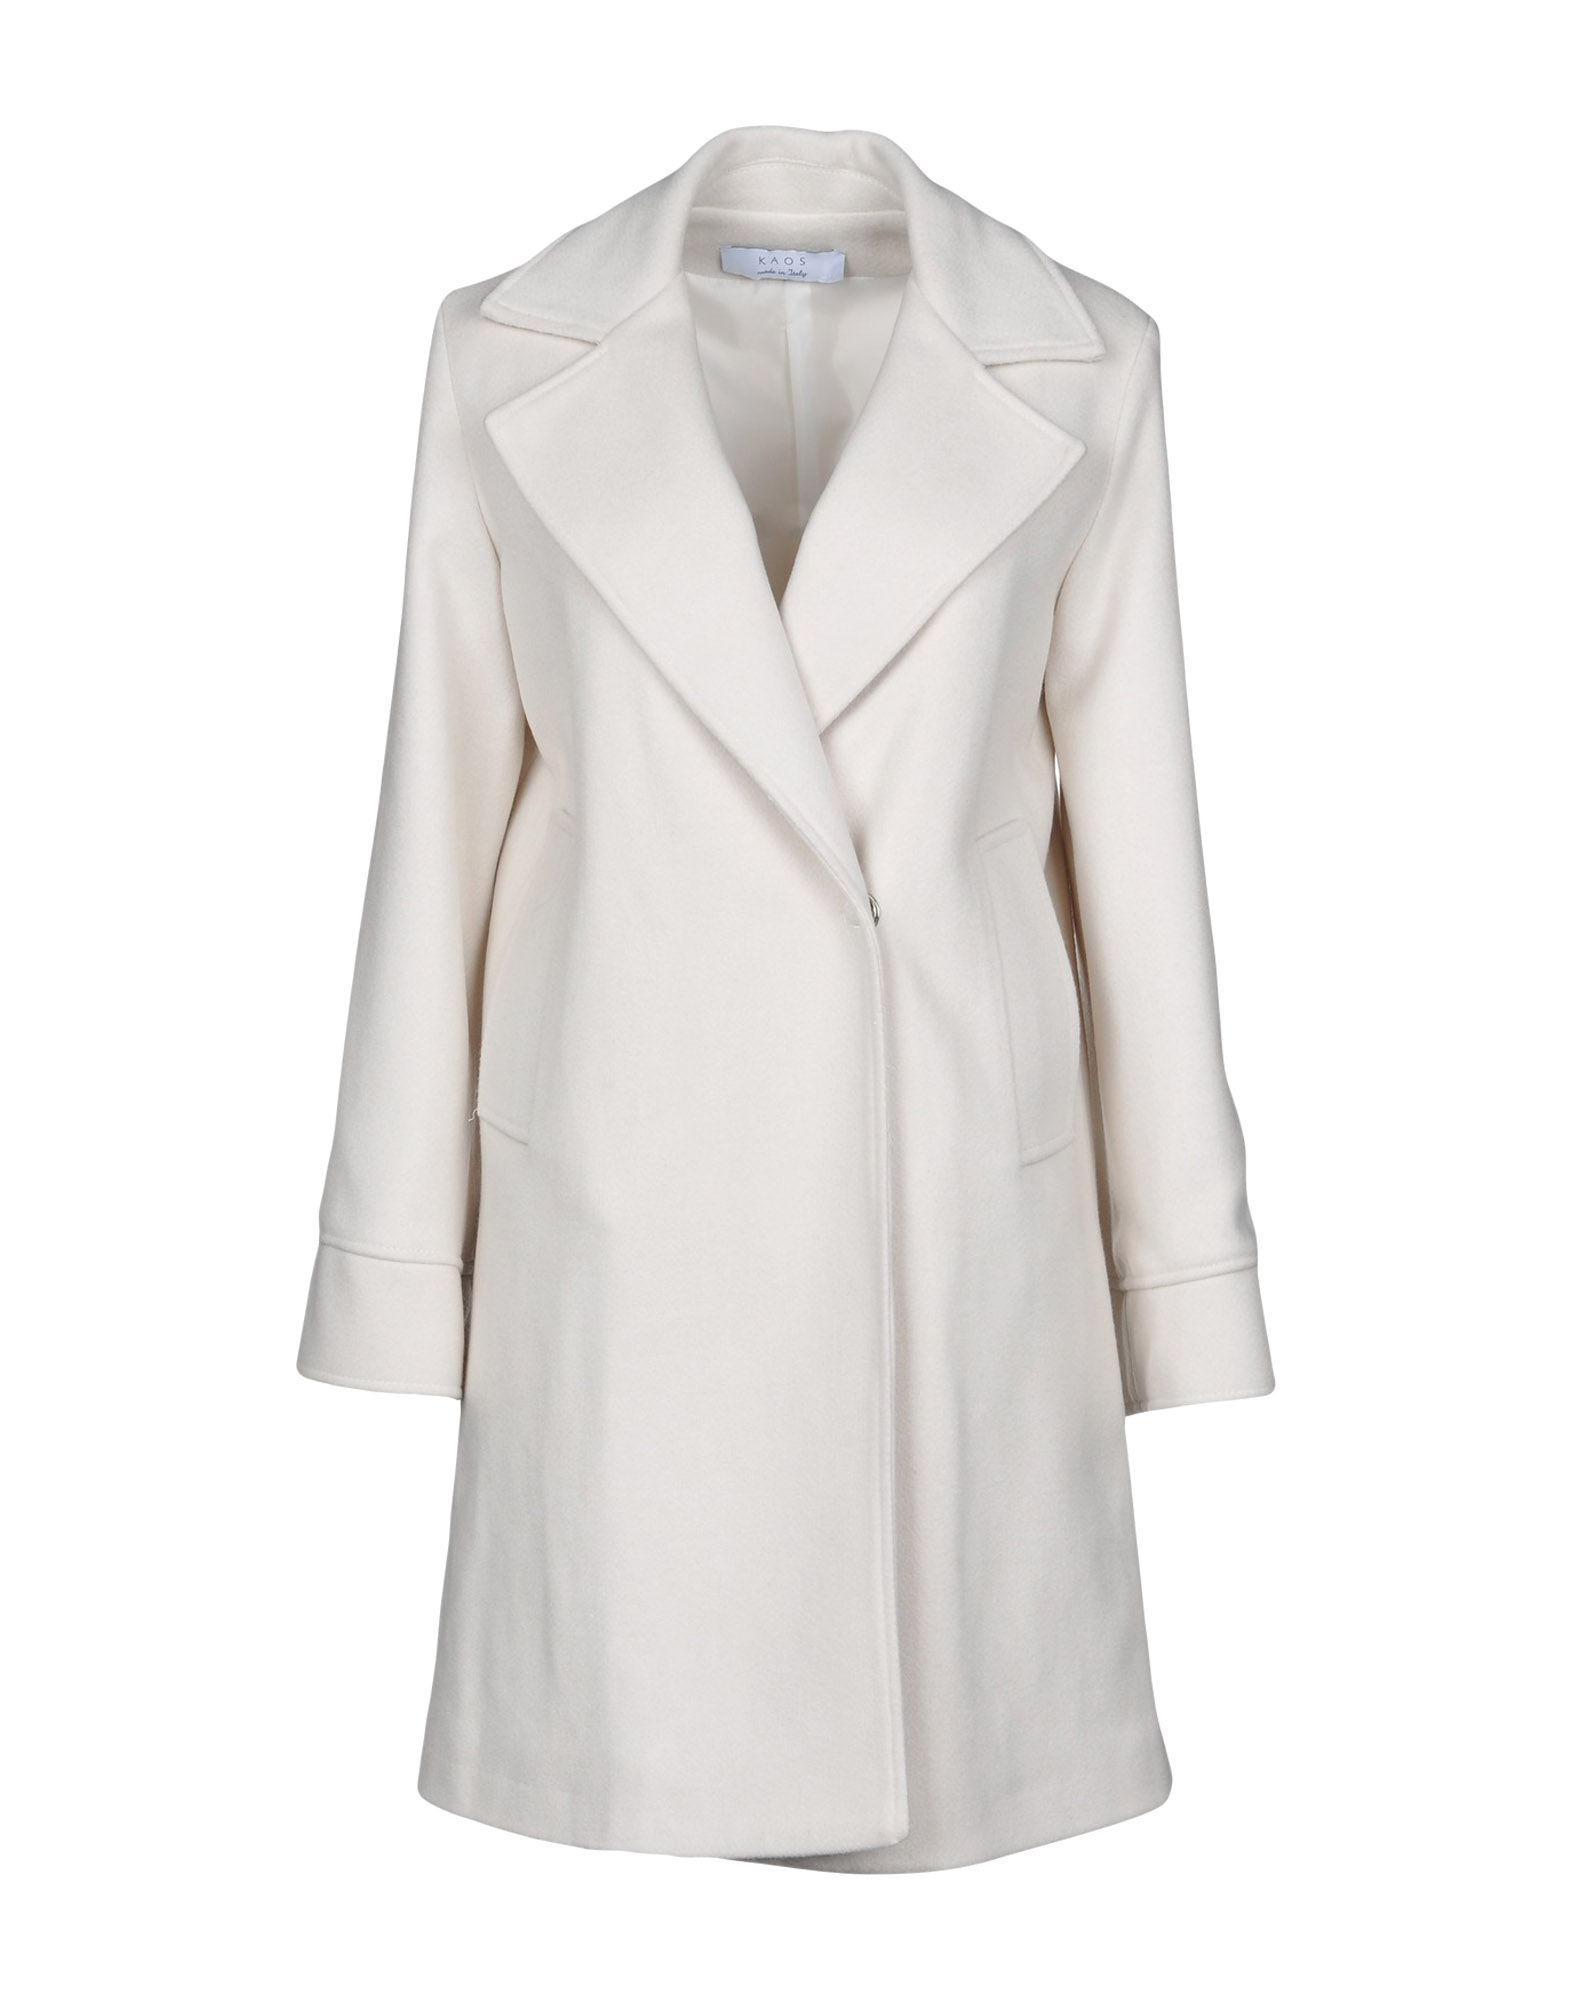 Cappotto Kaos Donna - Acquista online su JHlSm